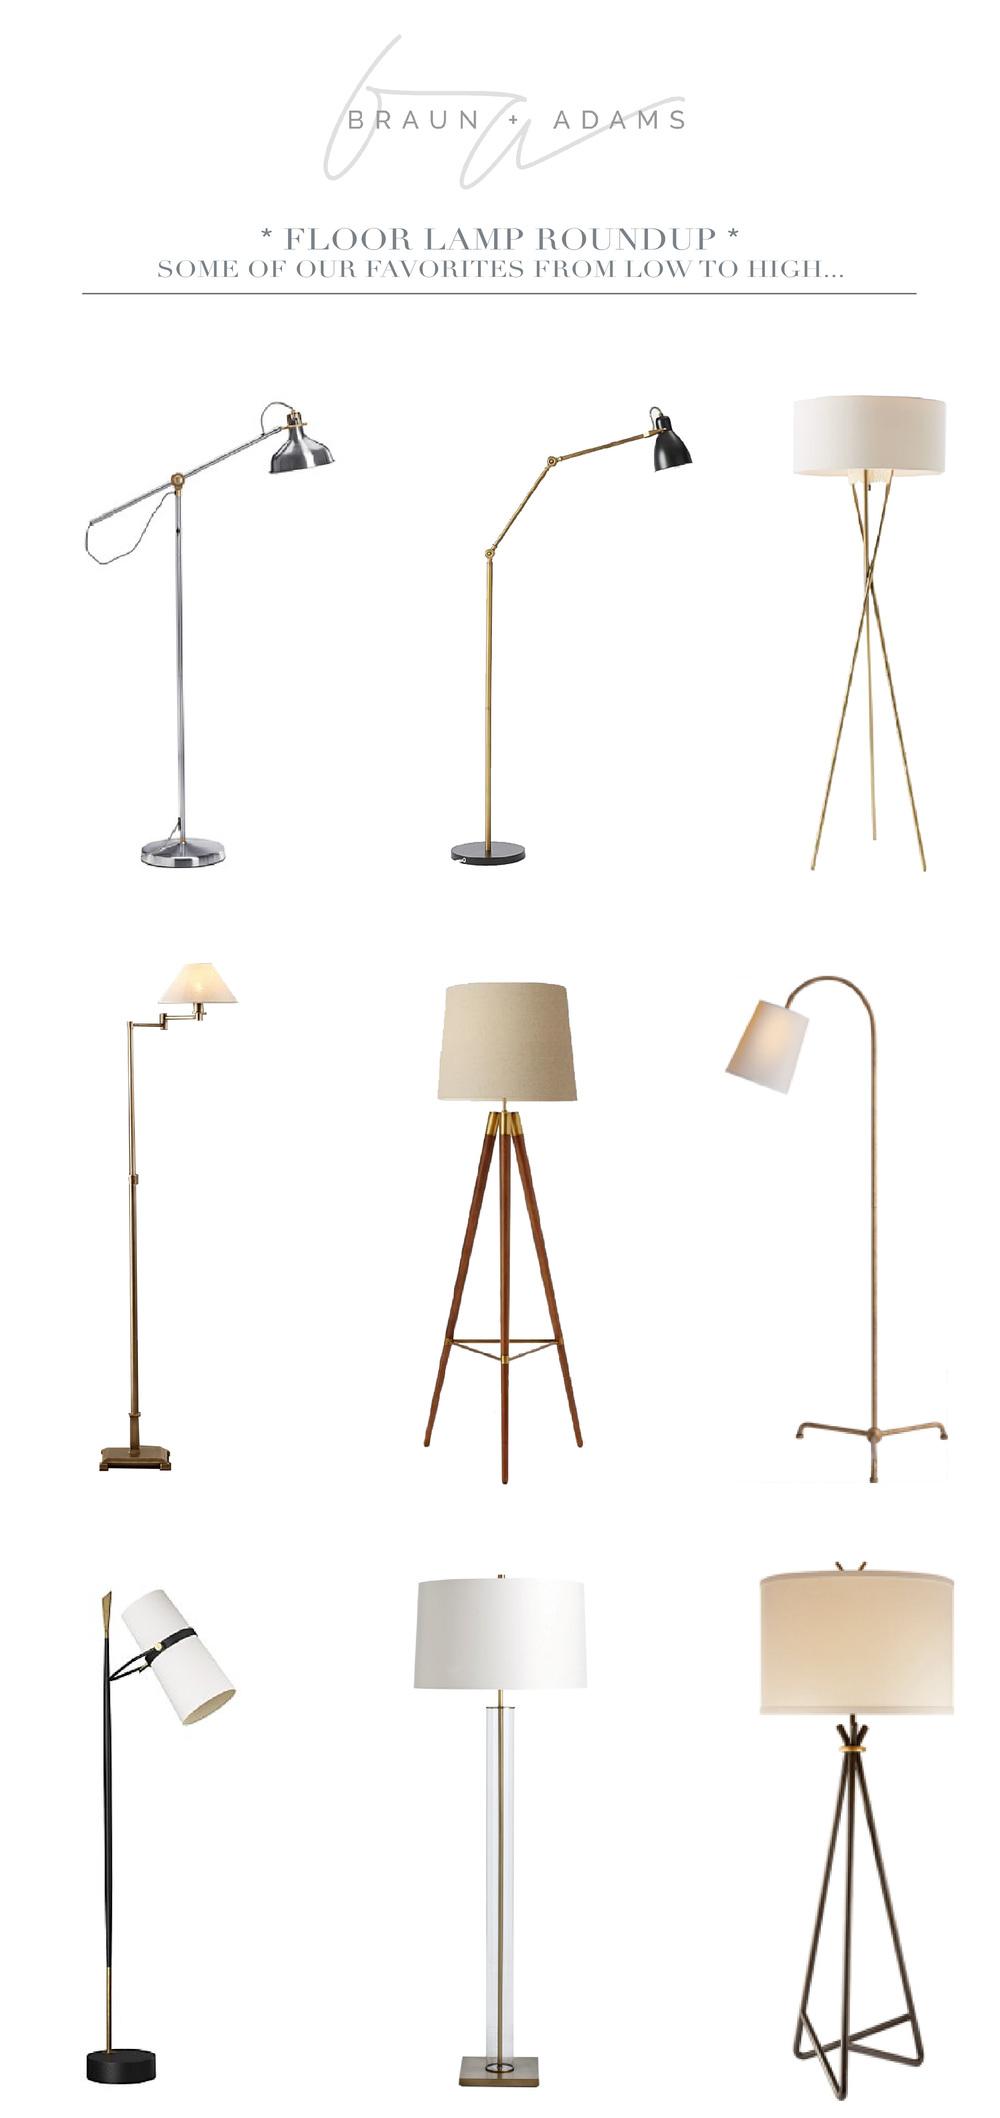 Floor lamp roundup braun adams aloadofball Gallery